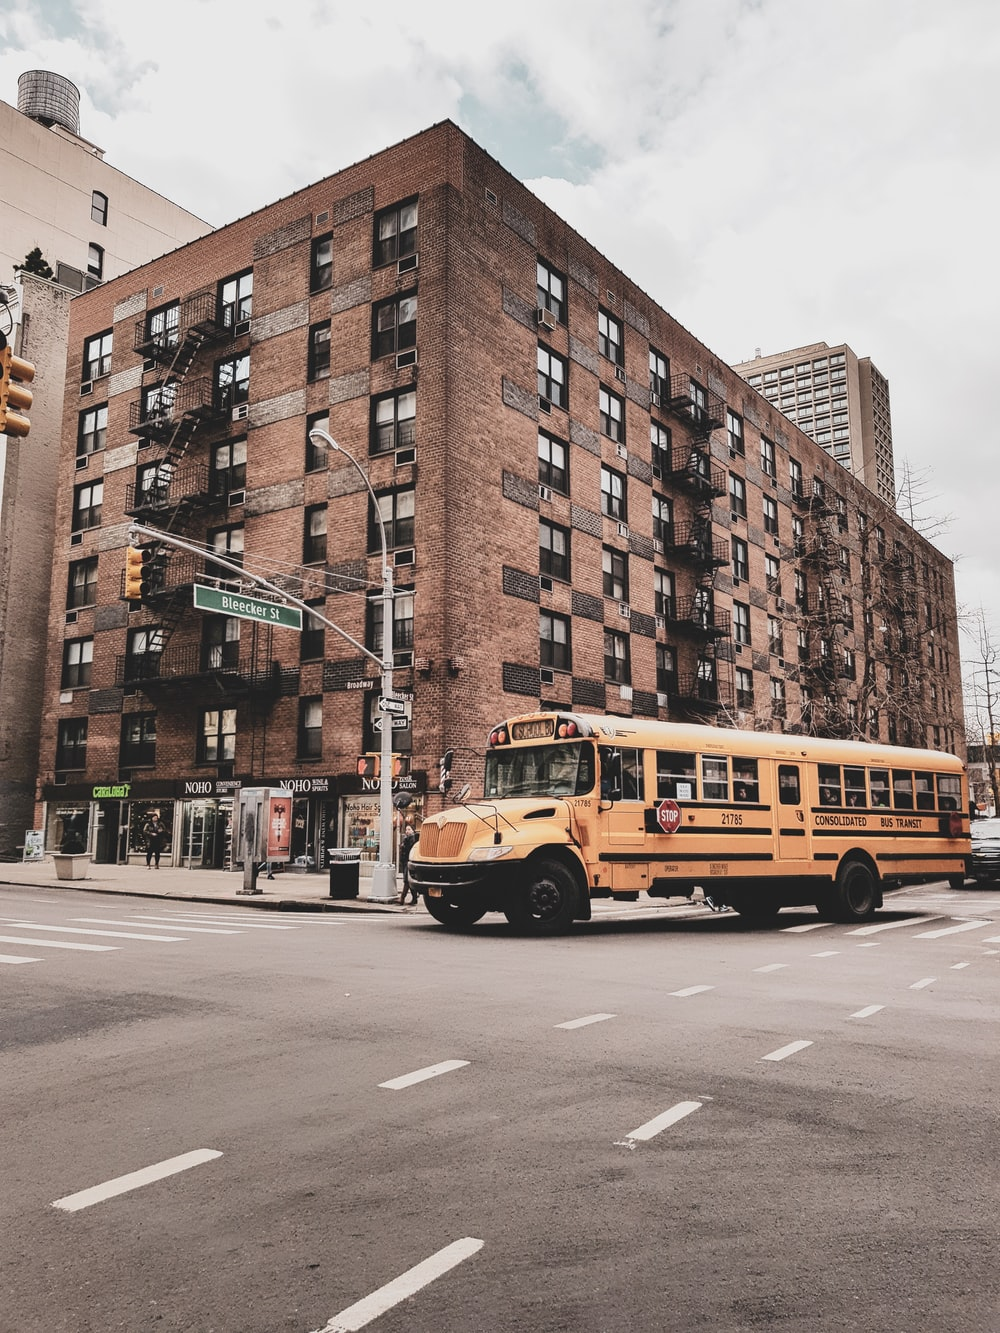 school bus near building